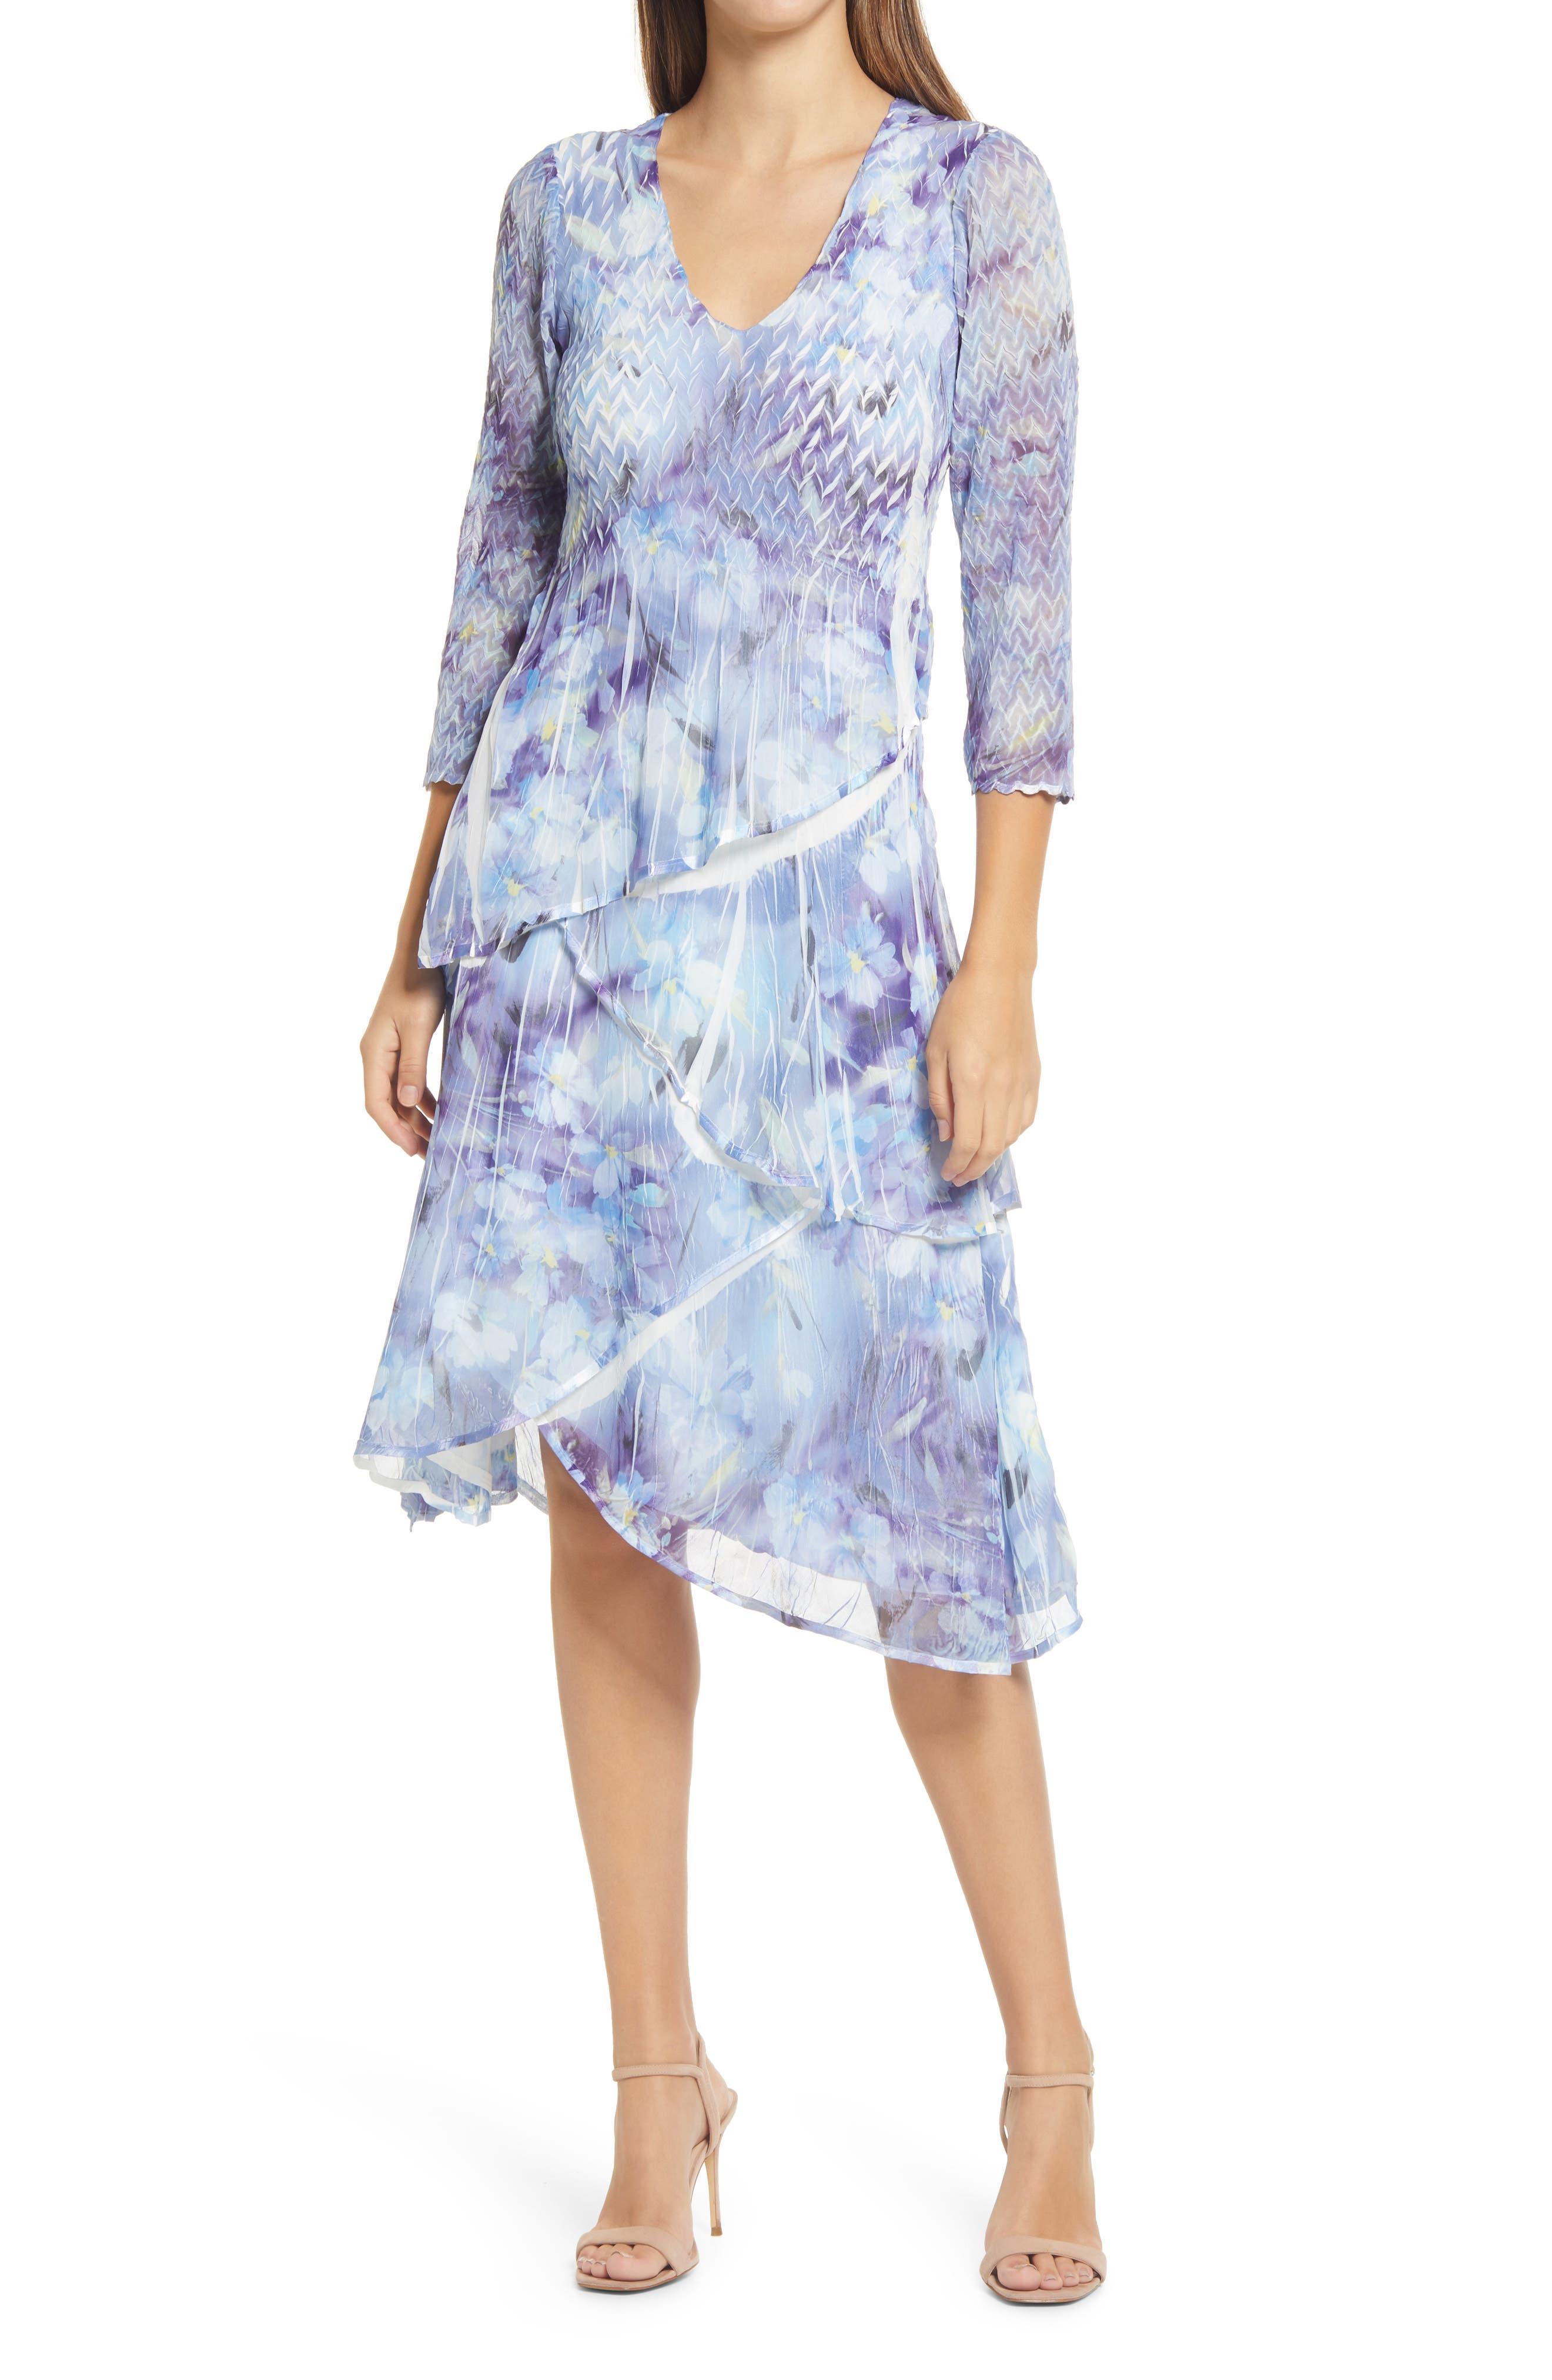 Image of Hydroderm Floral Tiered V-Neck Dress